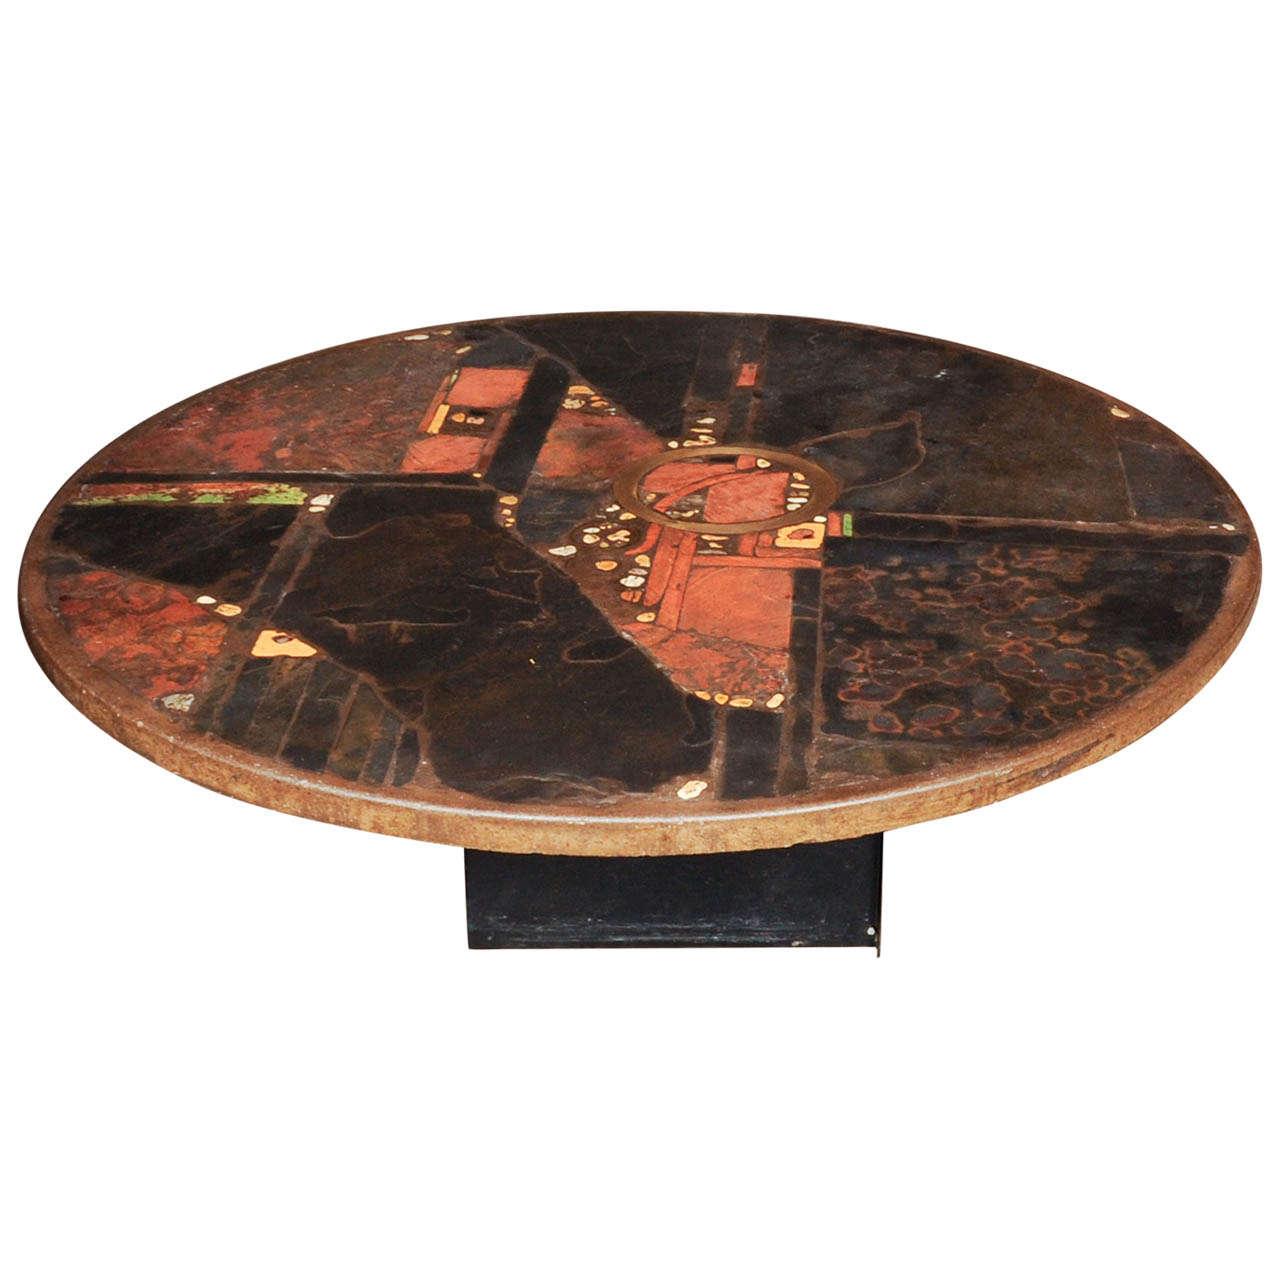 Large Slate Stone Coffee Table By Paul Kingma Signed Kingma 1981 At 1stdibs